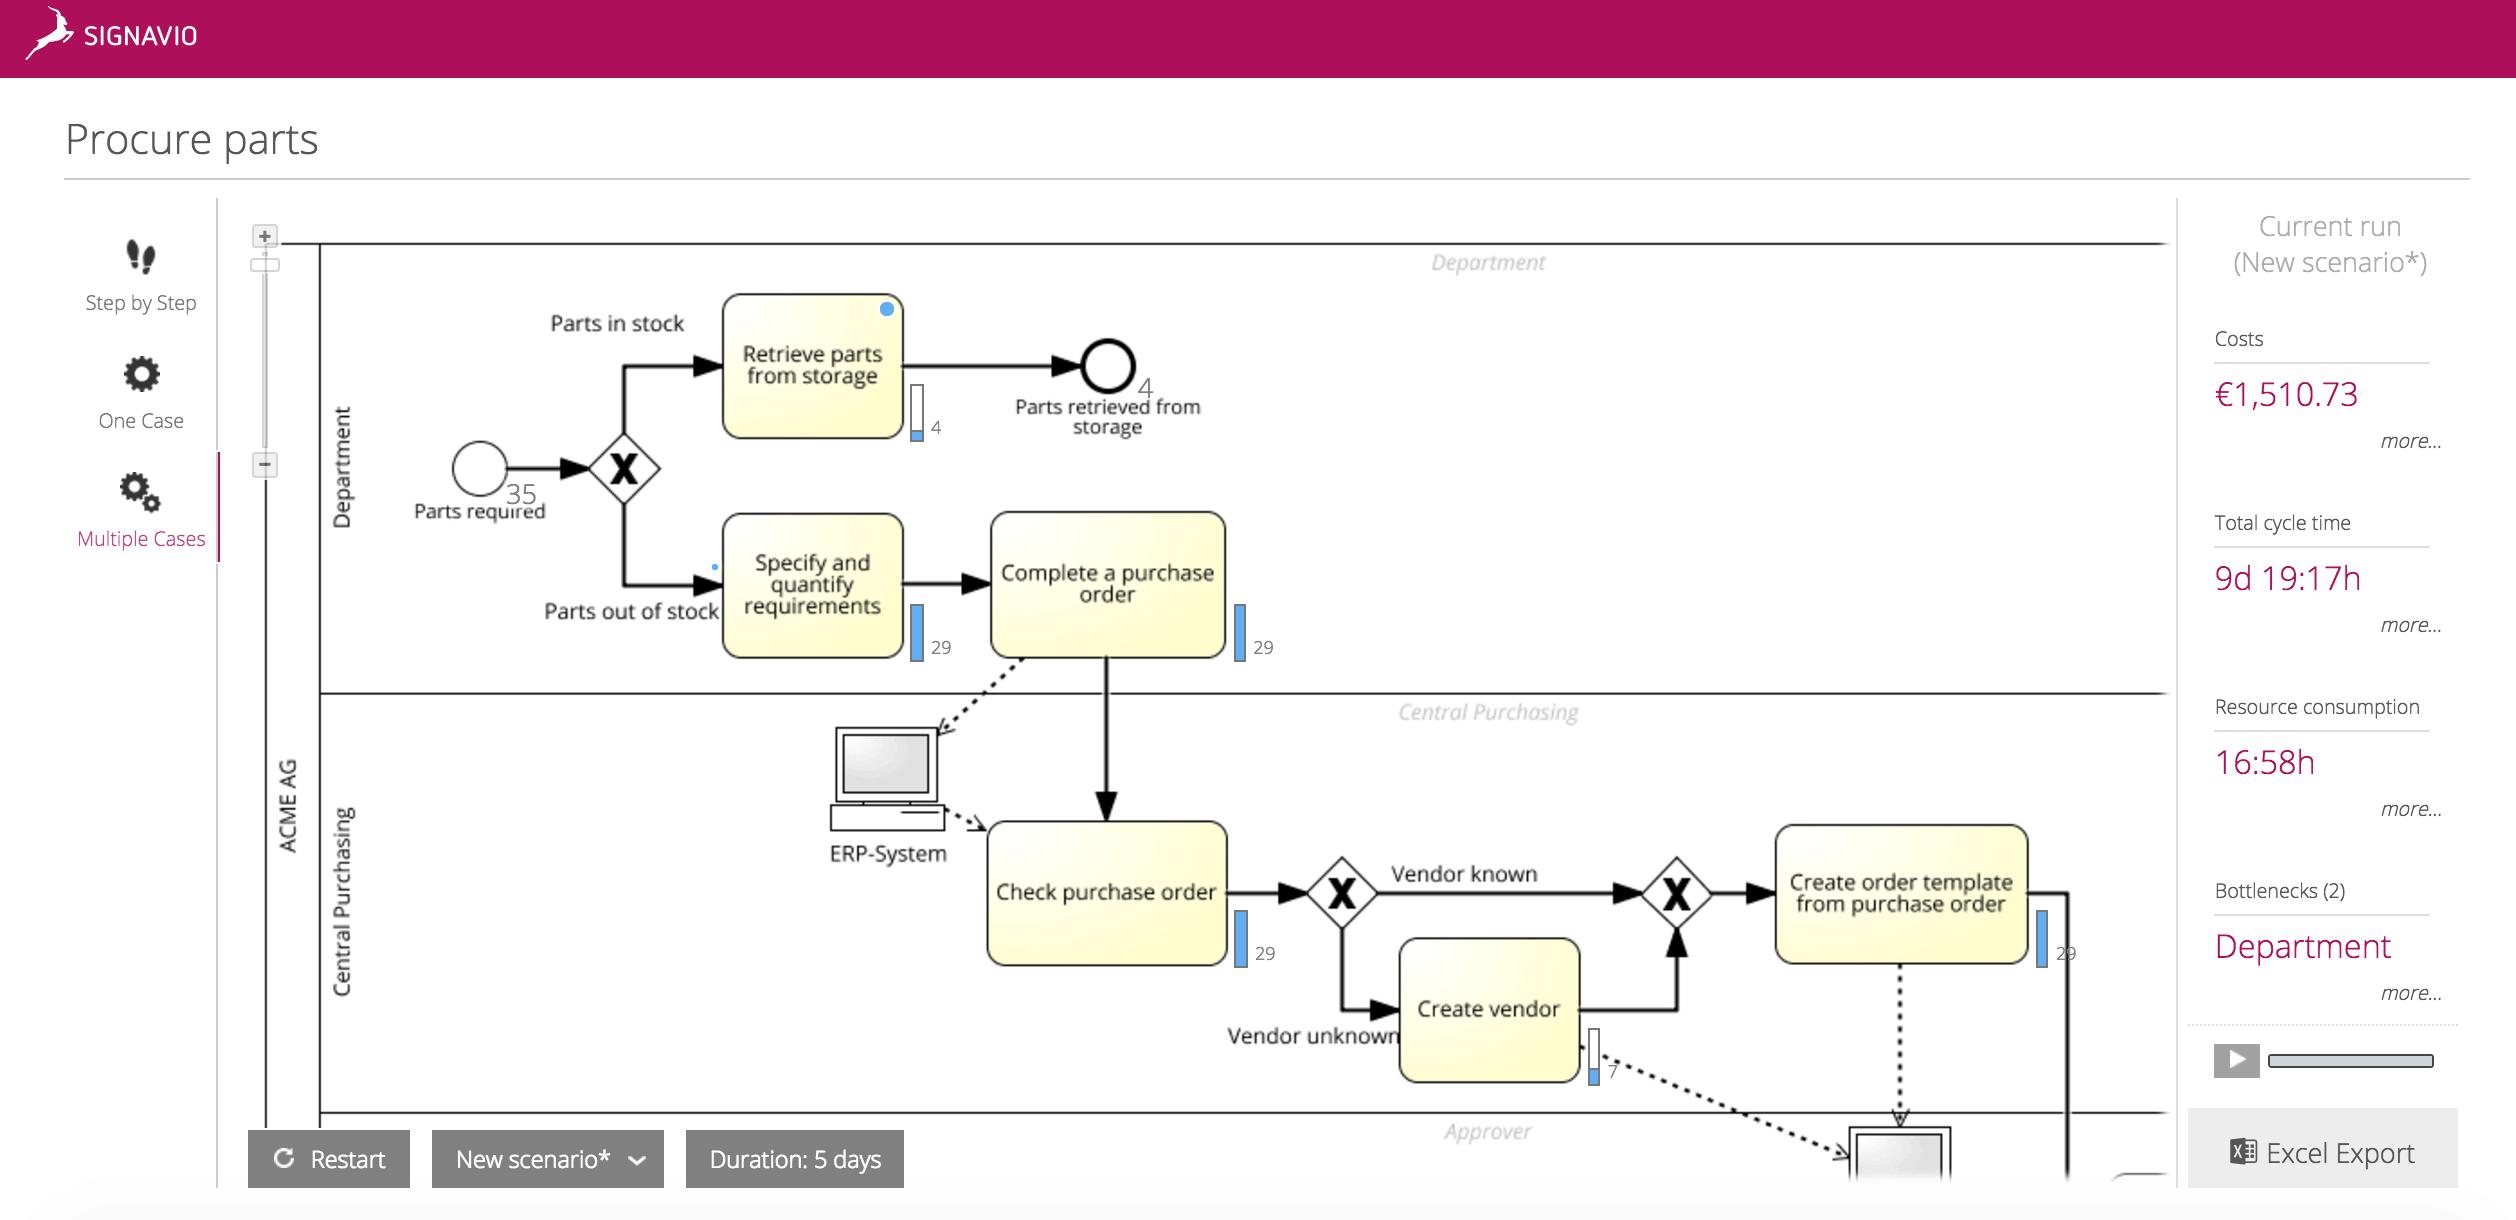 bpm simulation dashboard screenshot after redesign - Bpmn Simulation